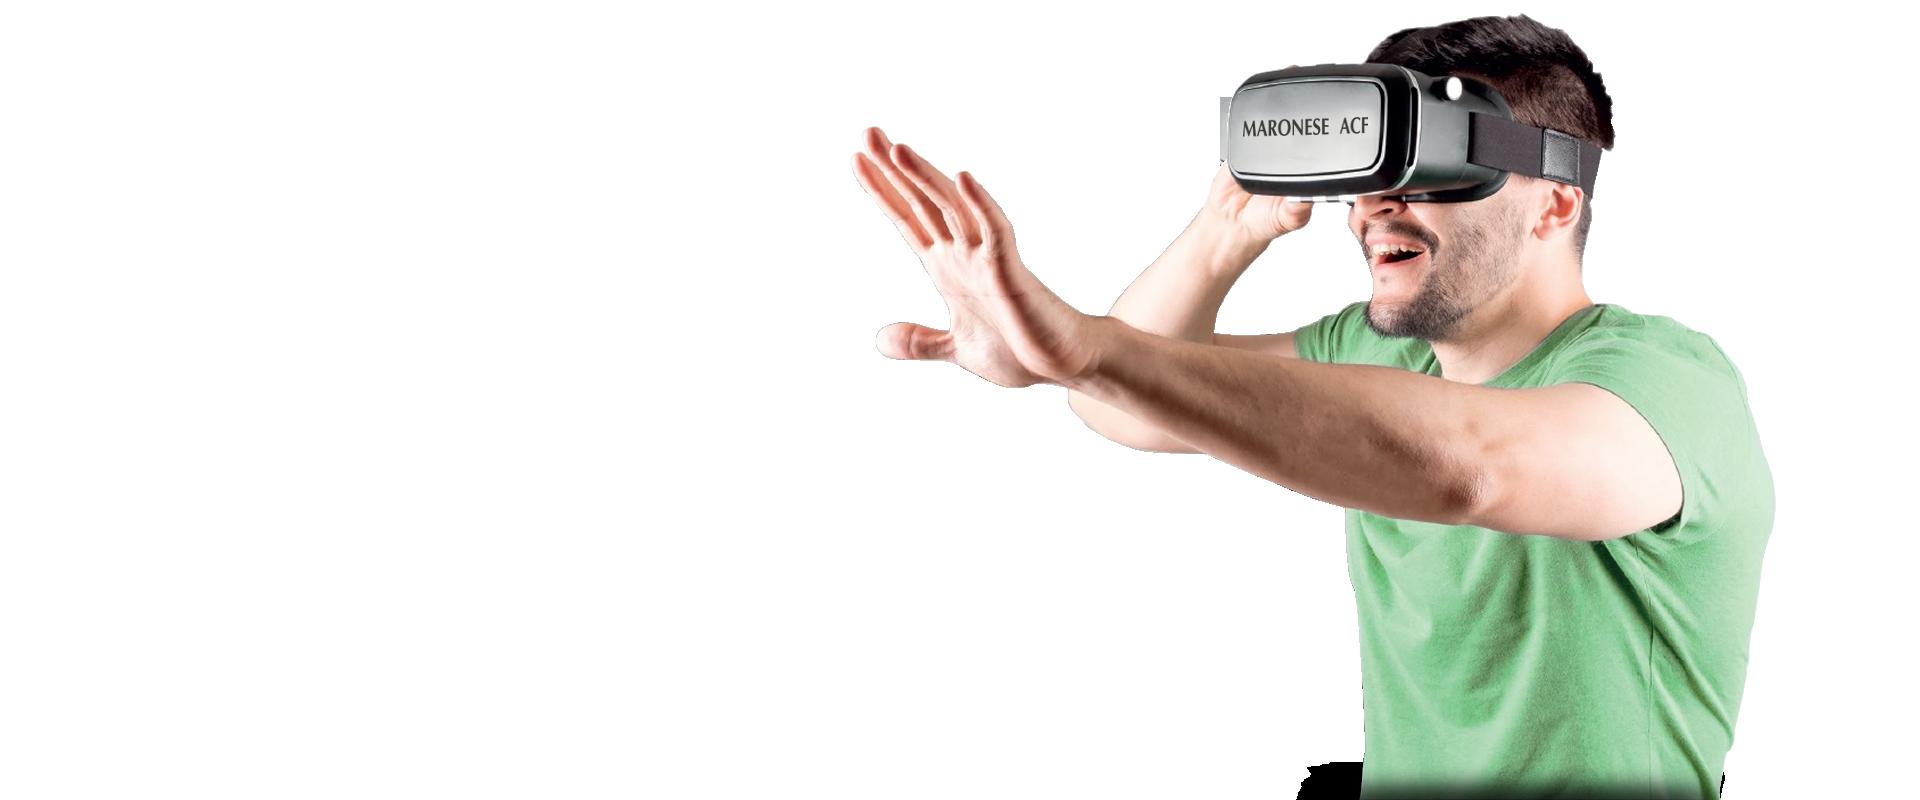 ManoneseACF VR